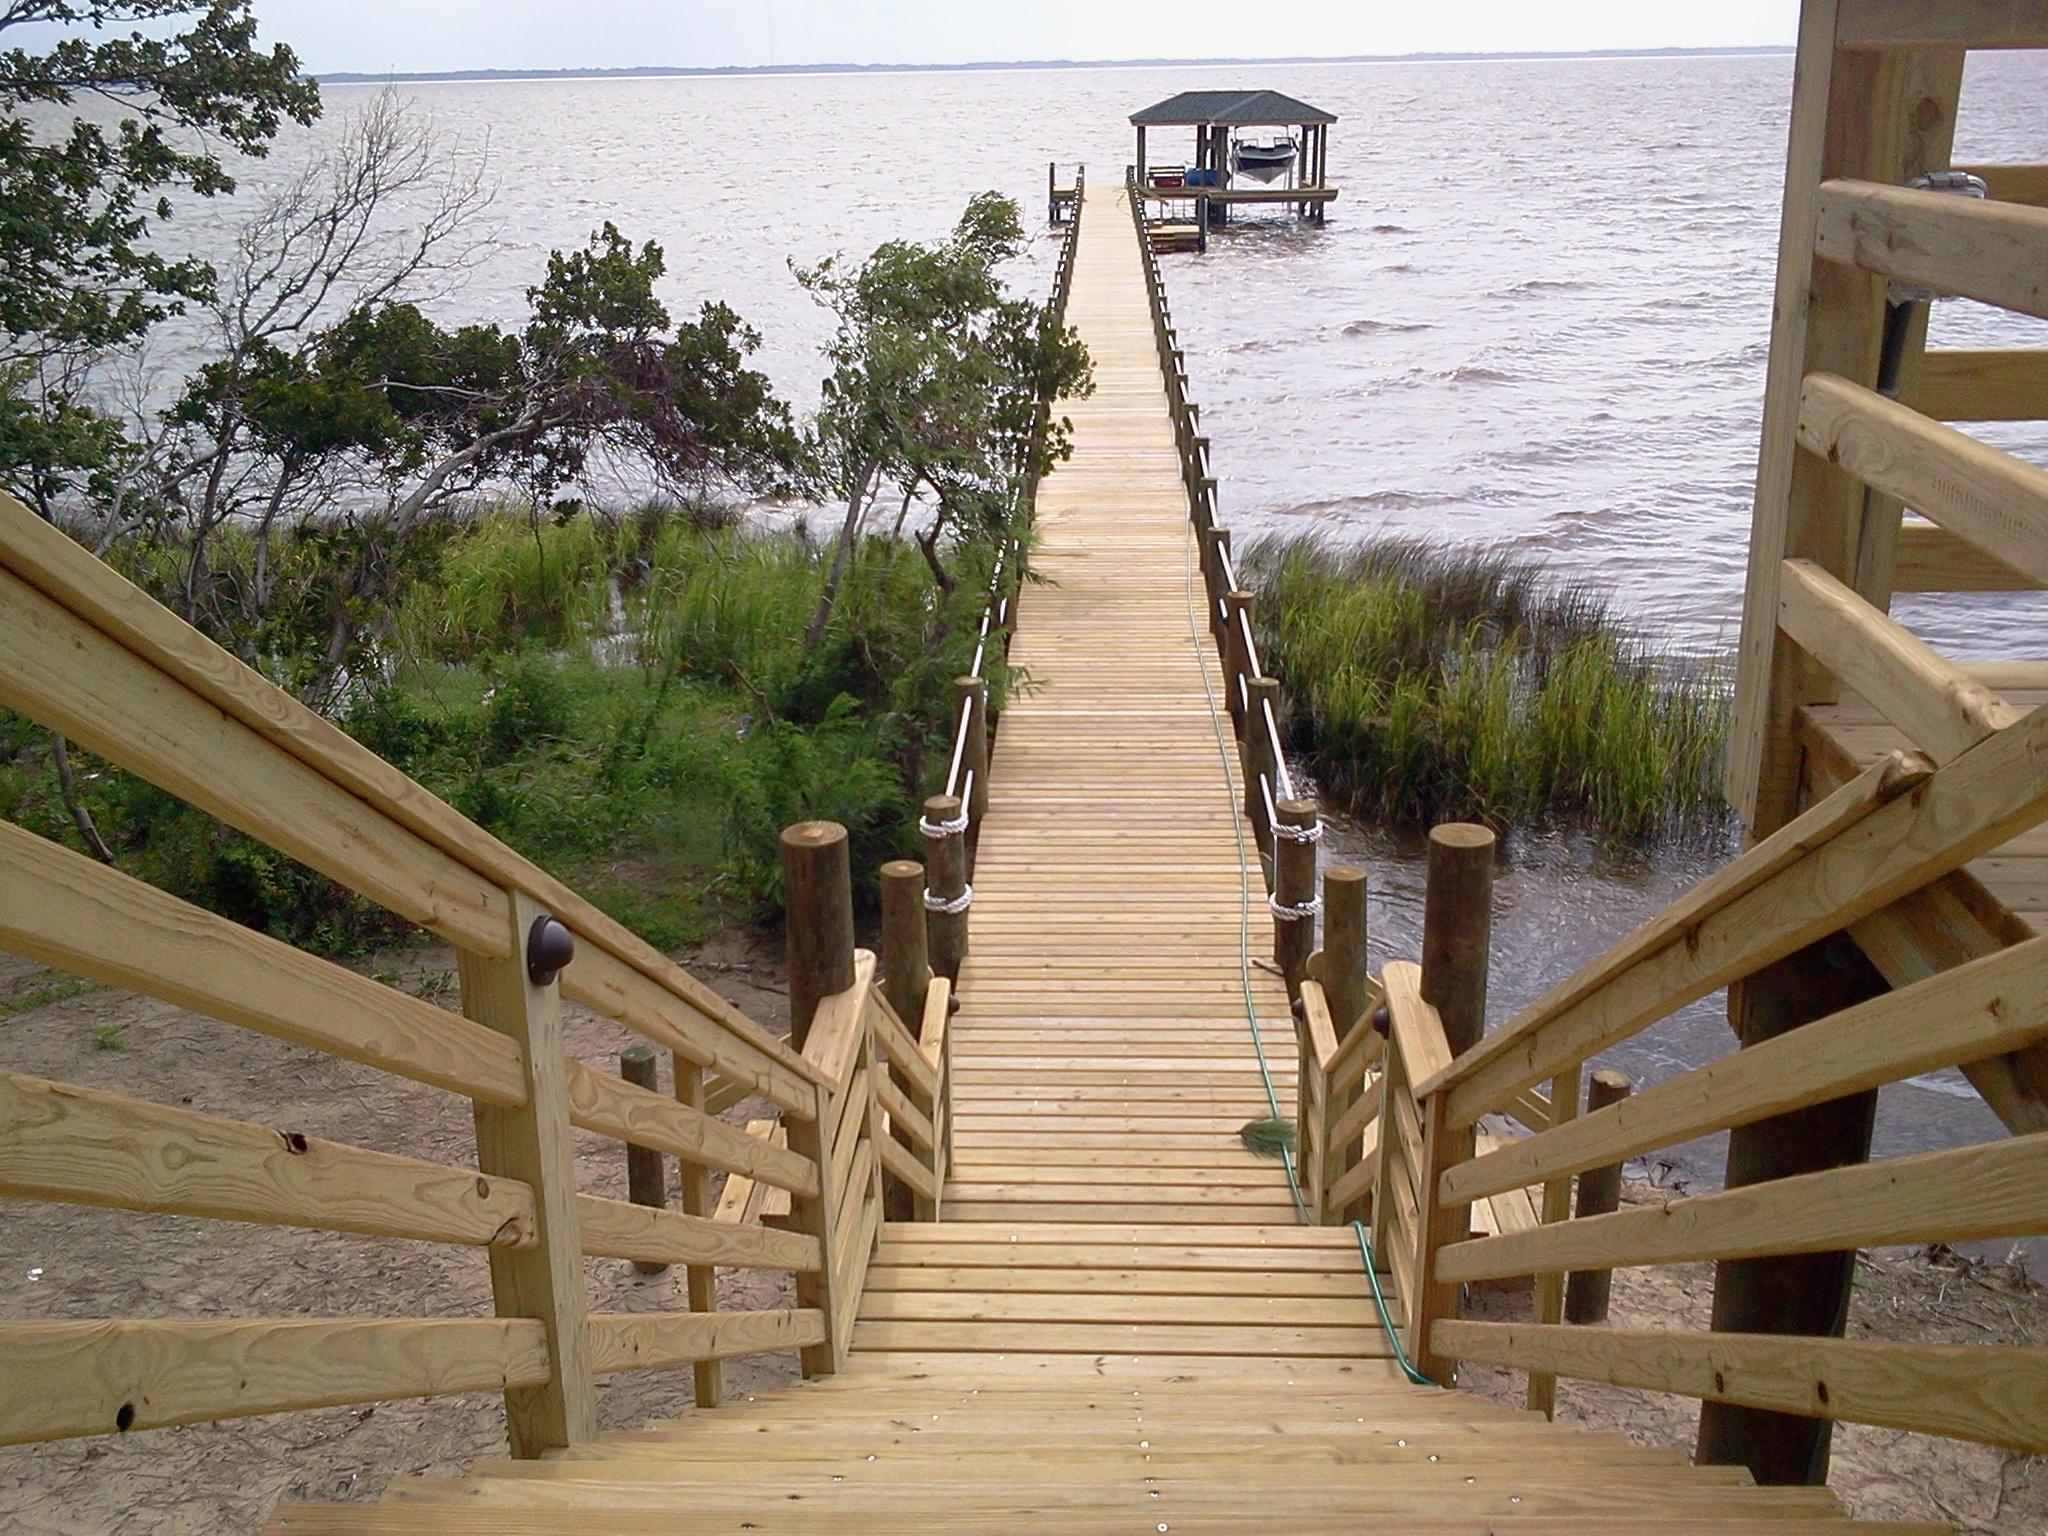 docks-piers-3.jpg